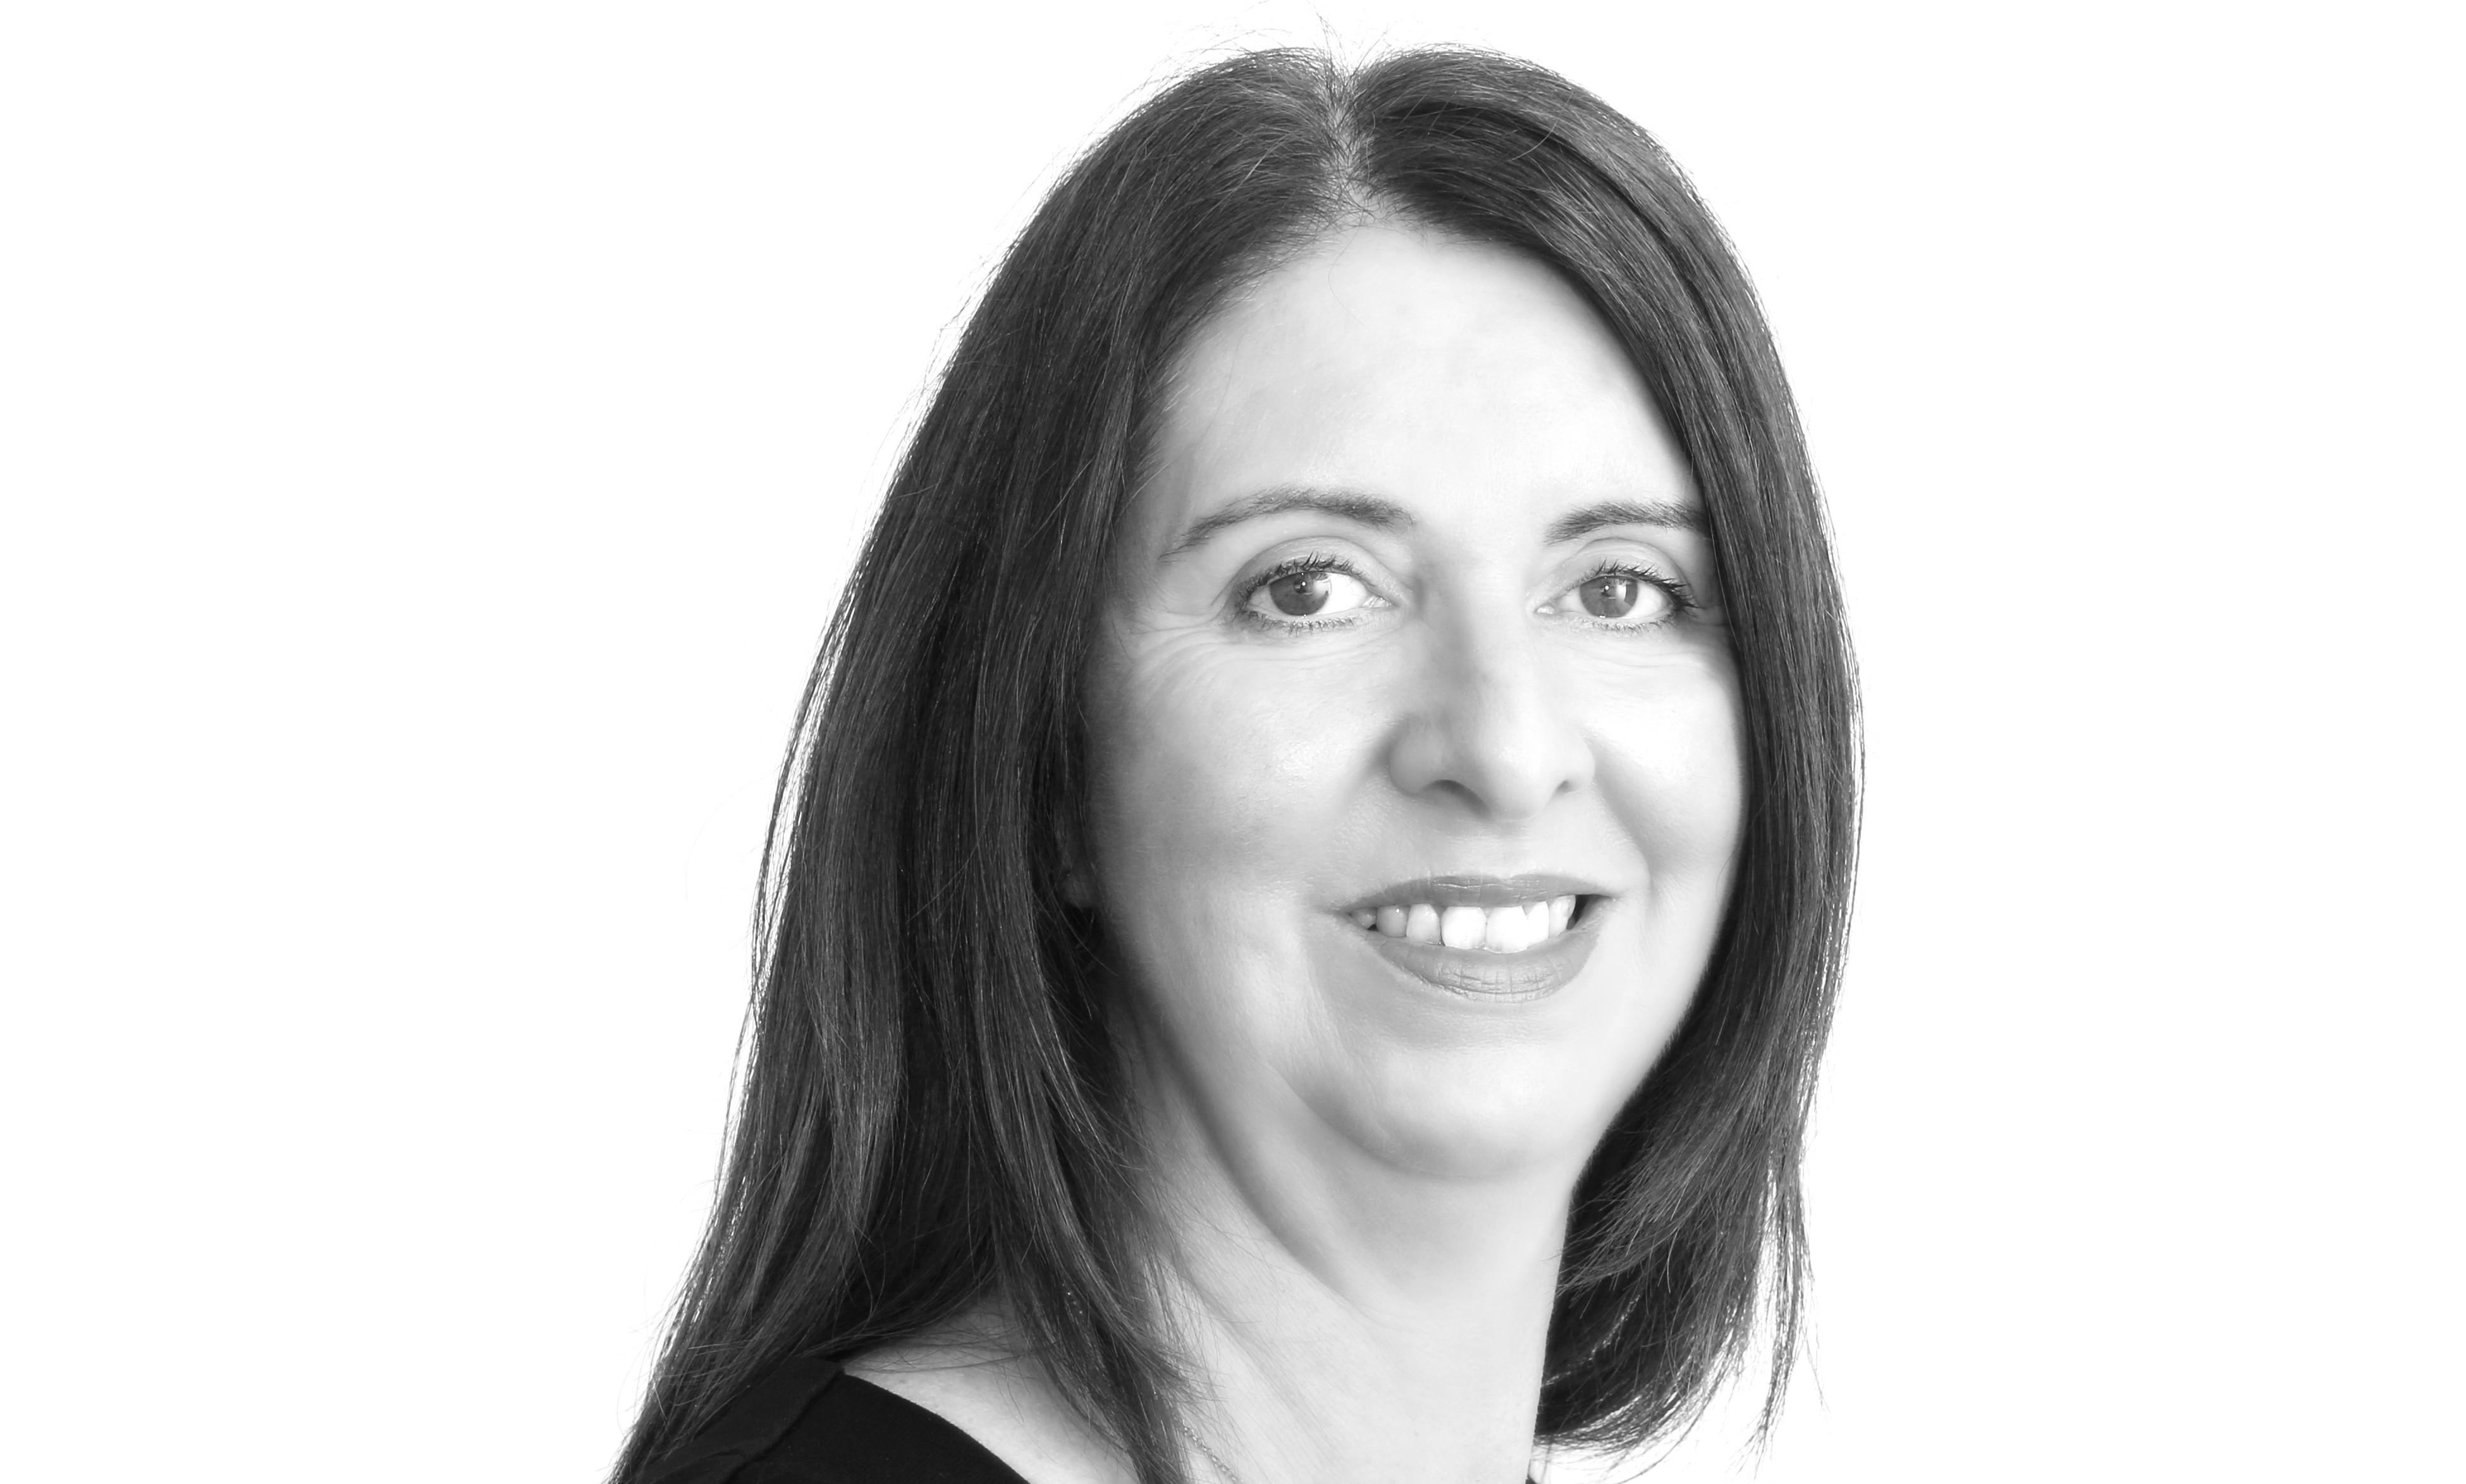 Sharon Gill-Wood